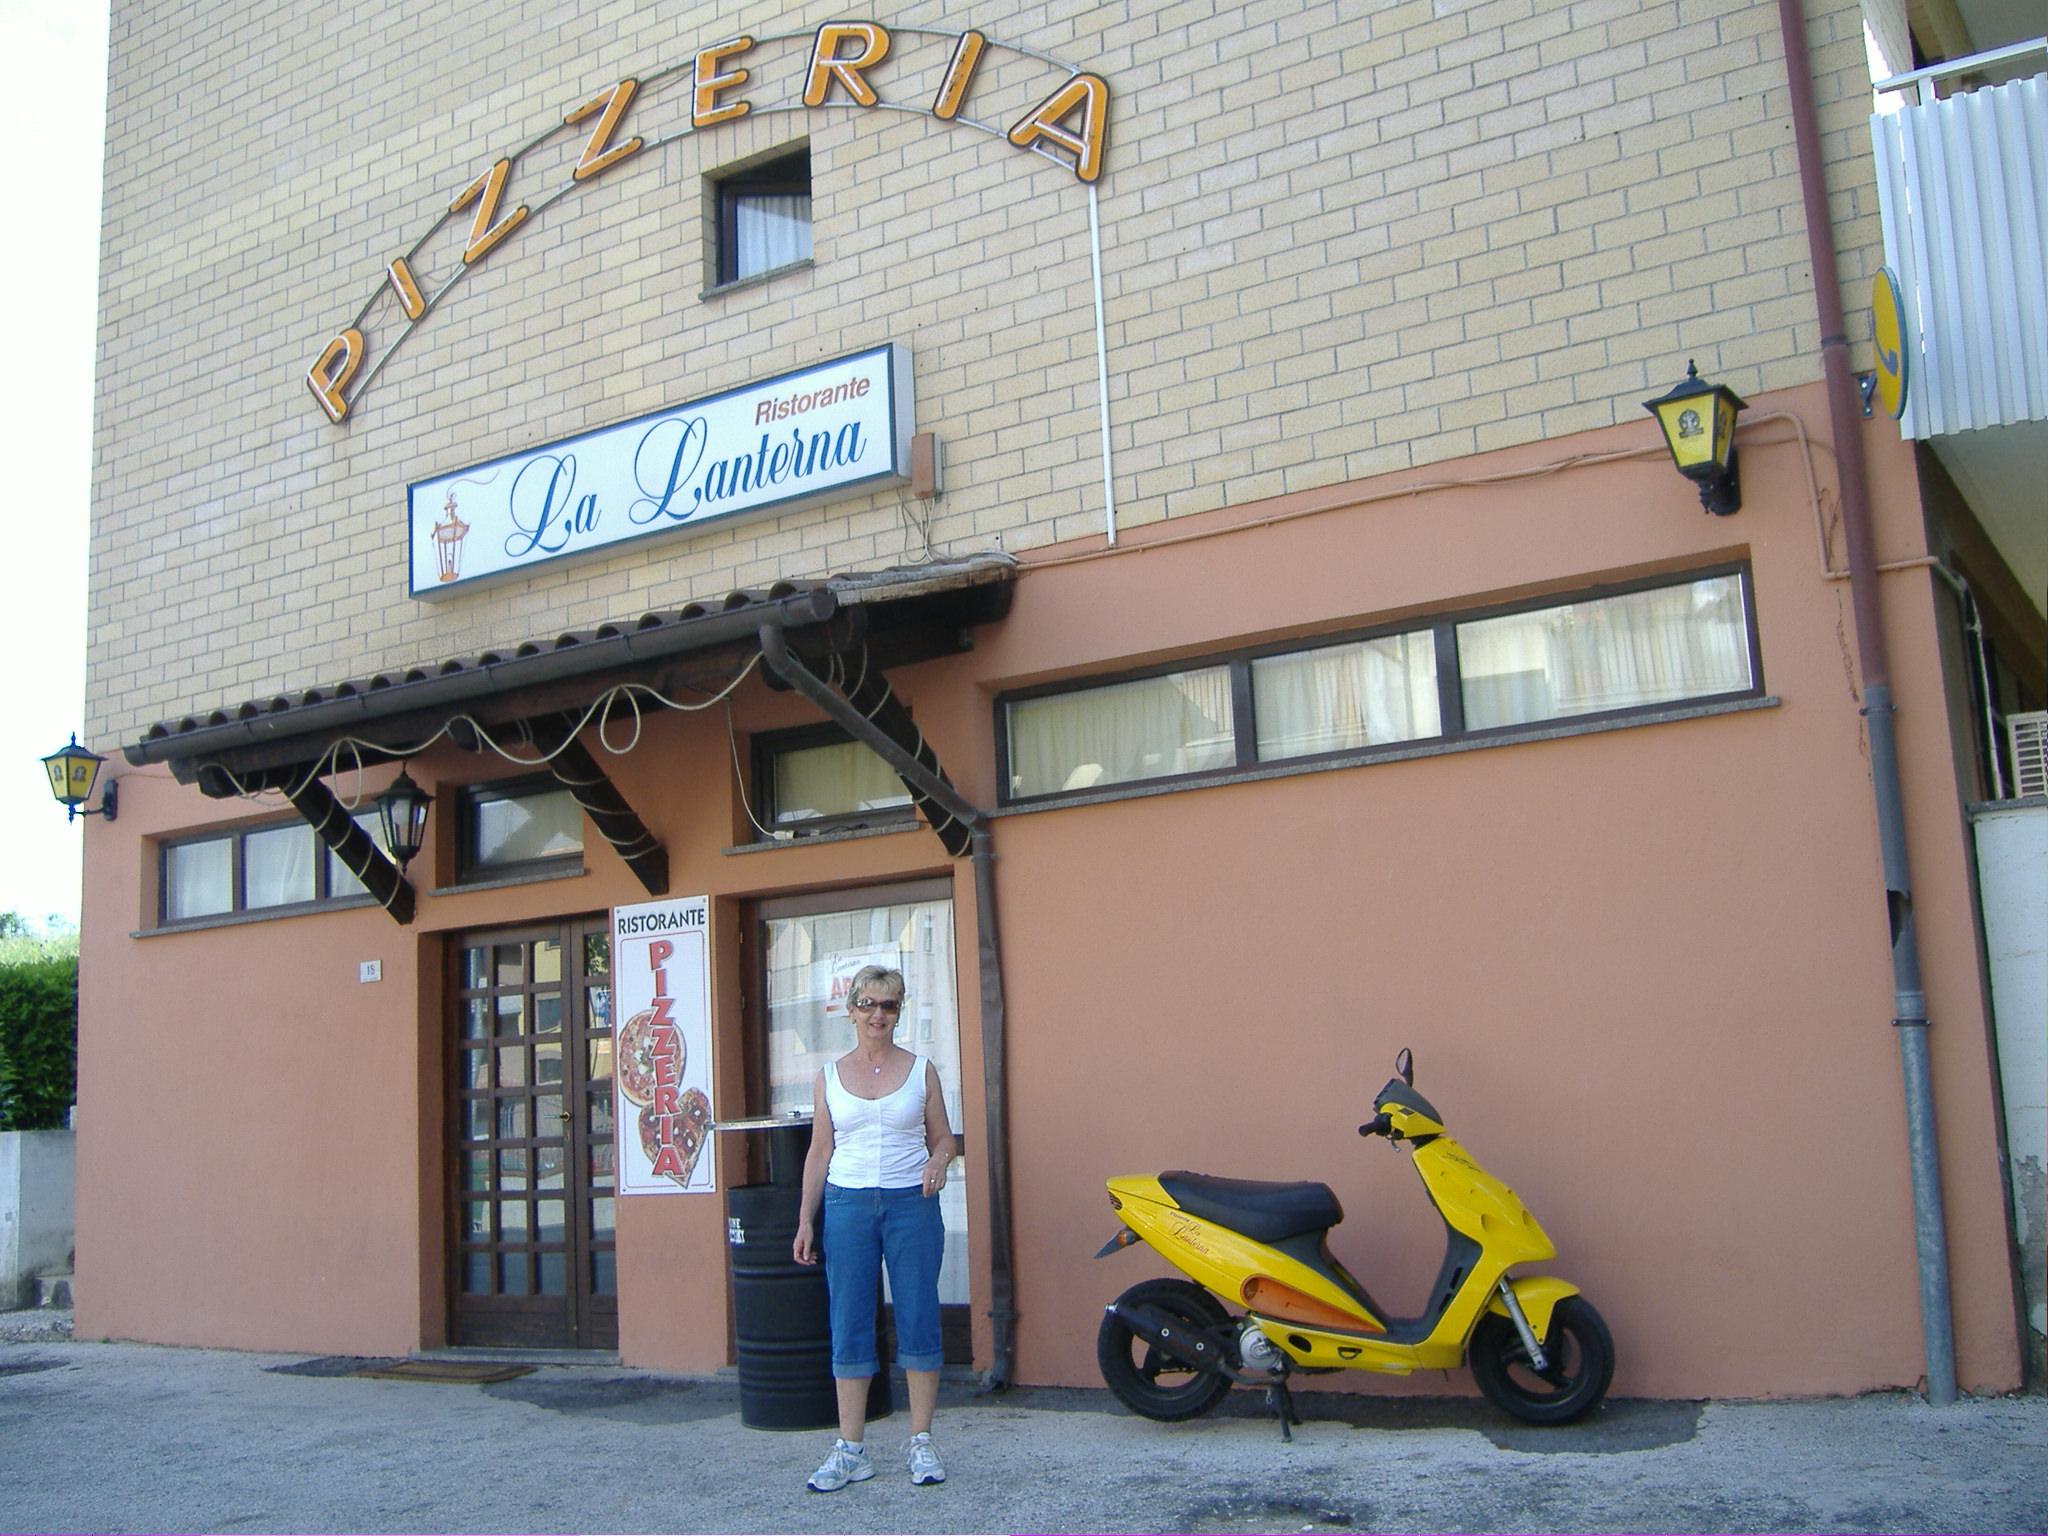 Castelraimondo Italy  City new picture : Language School in Castelraimondo | Travelling Italy with Lyn